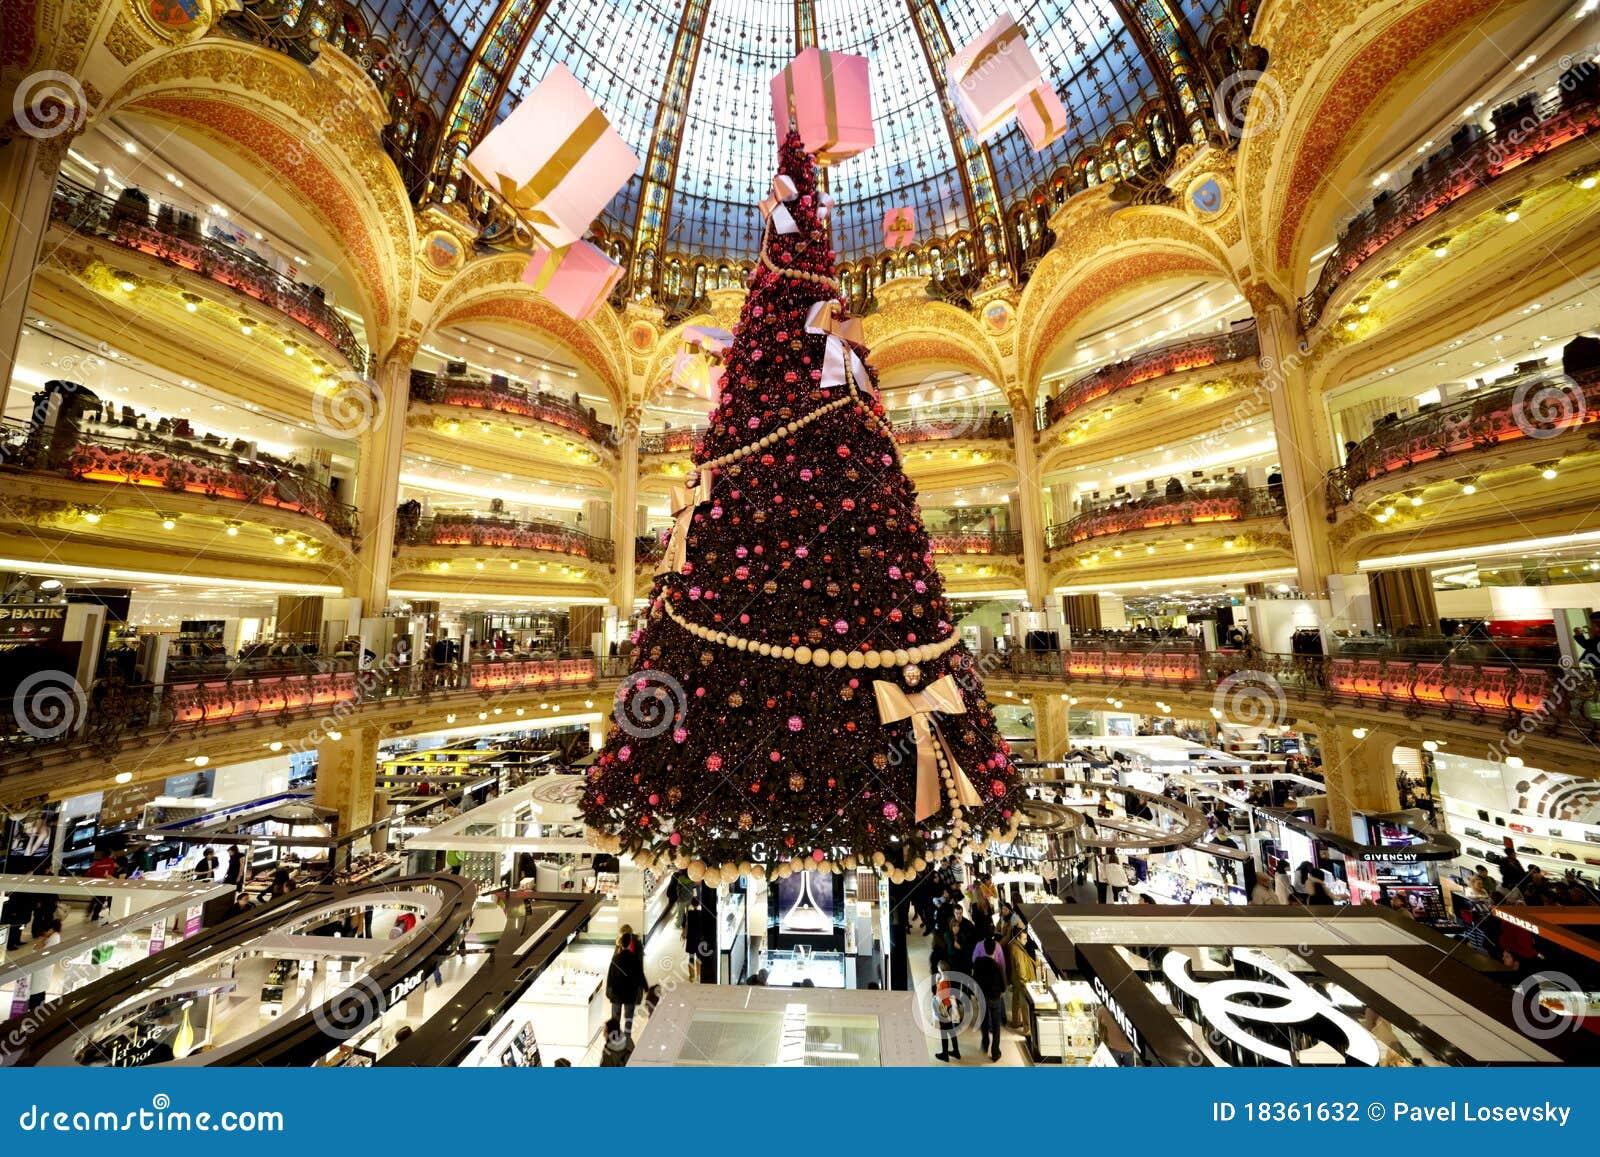 #AB8C20 The Christmas Tree At Galeries Lafayette Editorial  5431 décorations de noel galeries lafayette 1300x957 px @ aertt.com